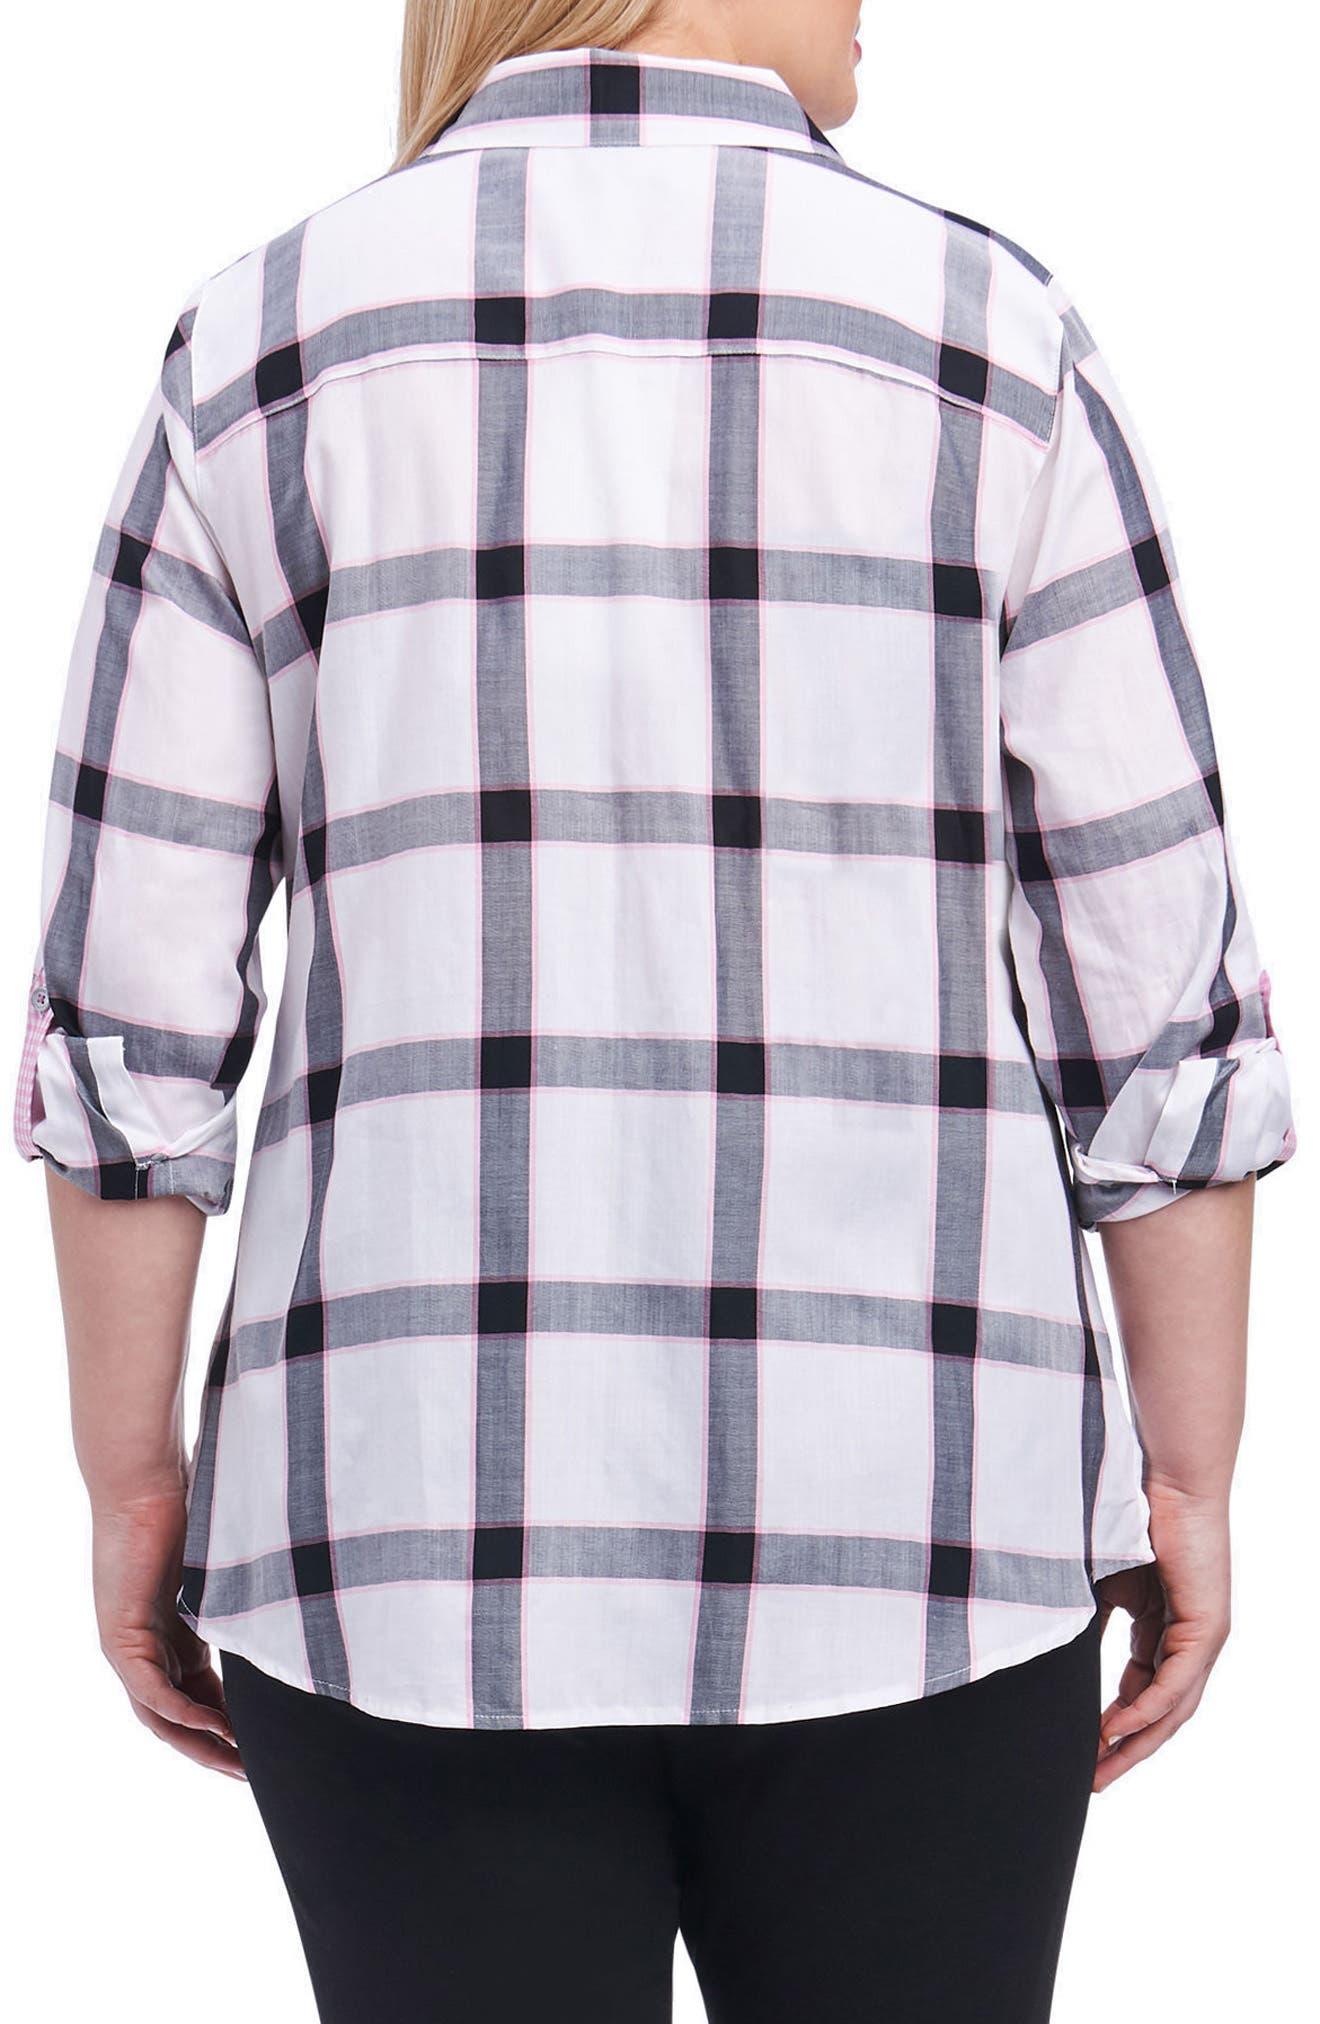 Alternate Image 2  - Foxcroft Zoey Herringbone Plaid Shirt (Plus Size)